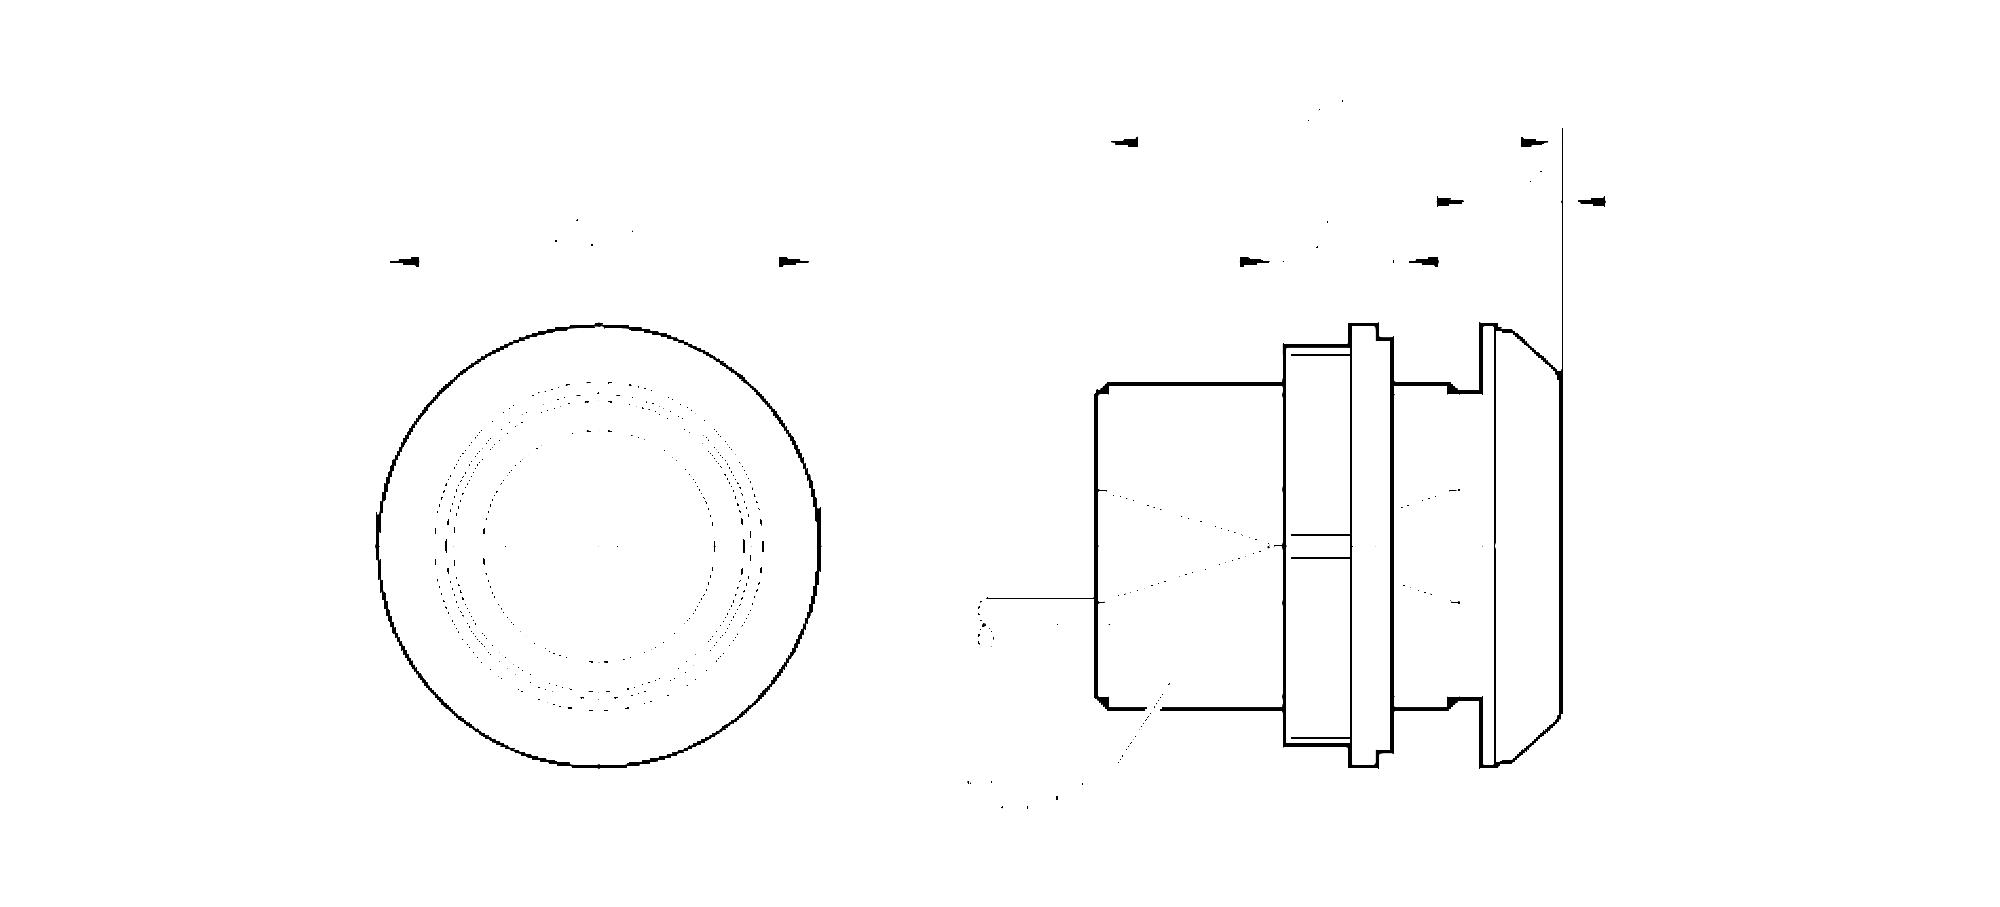 kt5102 - capacitive illuminated pushbutton